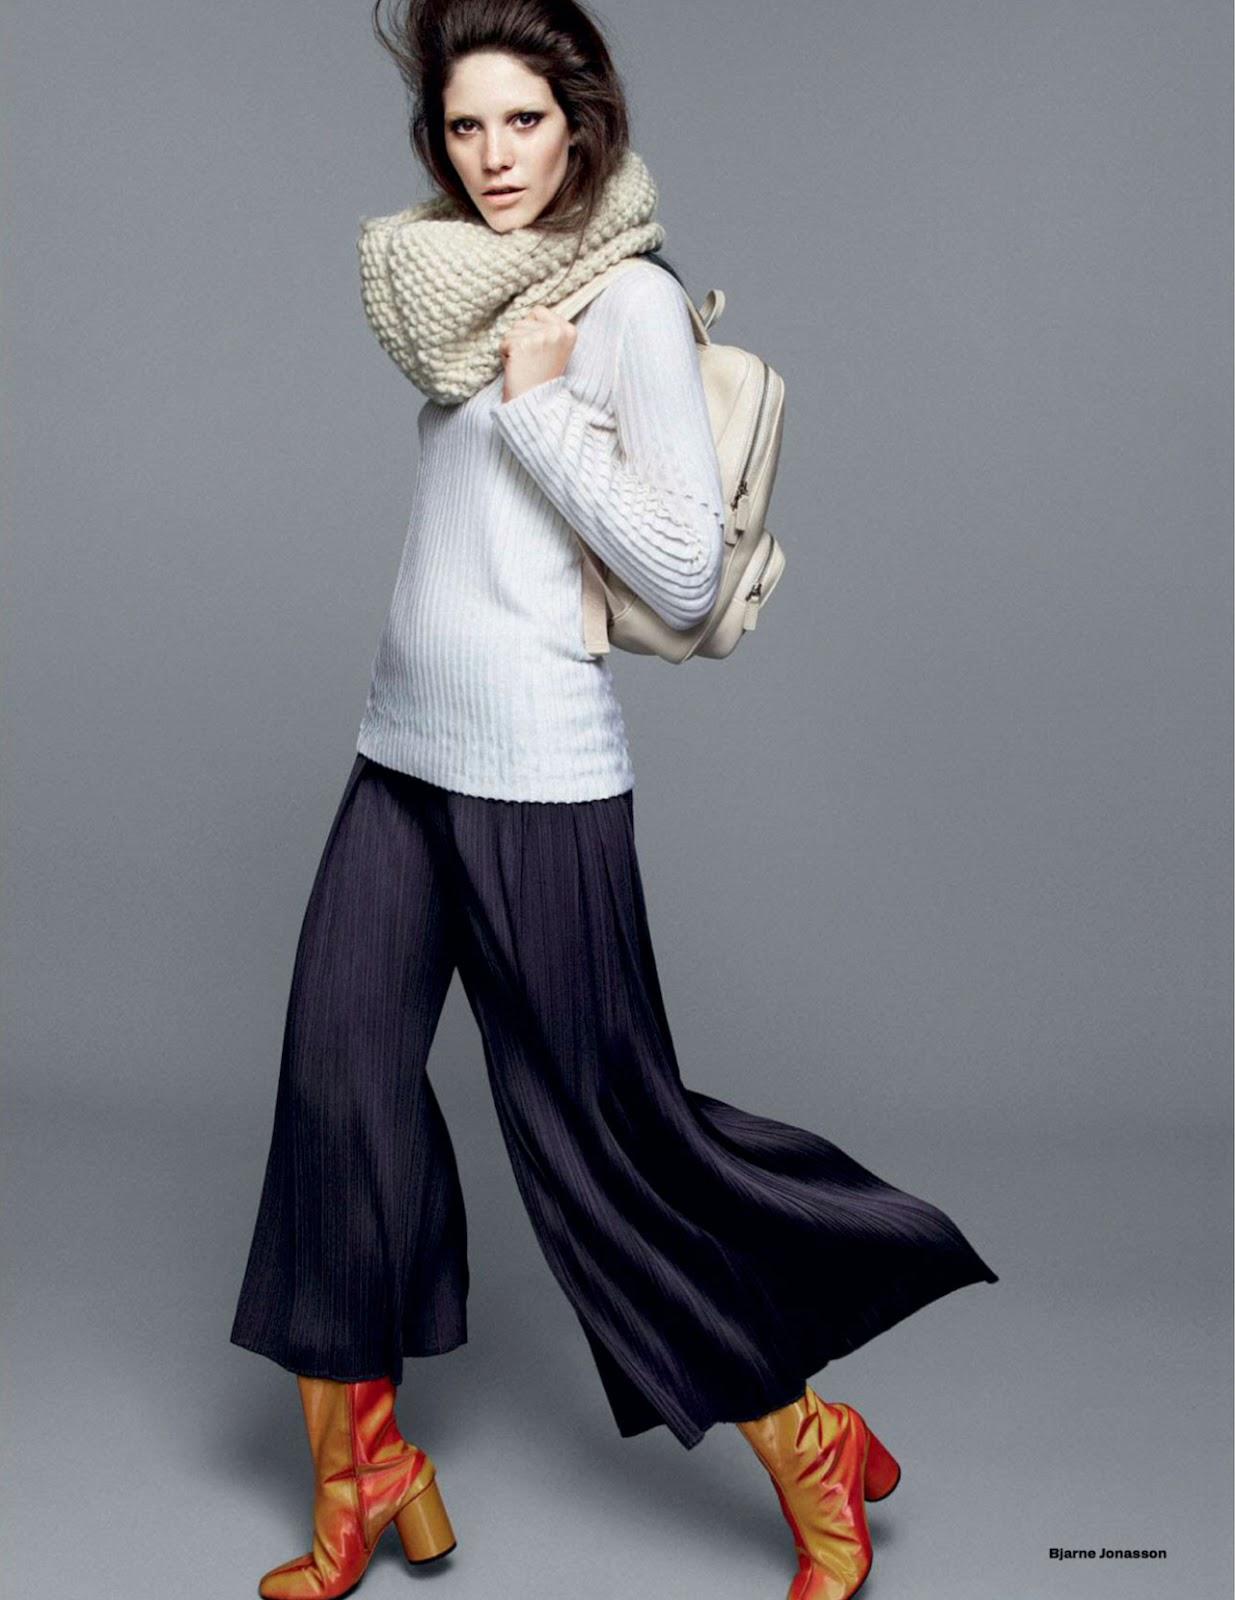 Carla Ciffoni Layers In Fall Knitwear For Elle Uk By: In The Loop: Carla Ciffoni By Bjarne Jonasson For Uk Elle